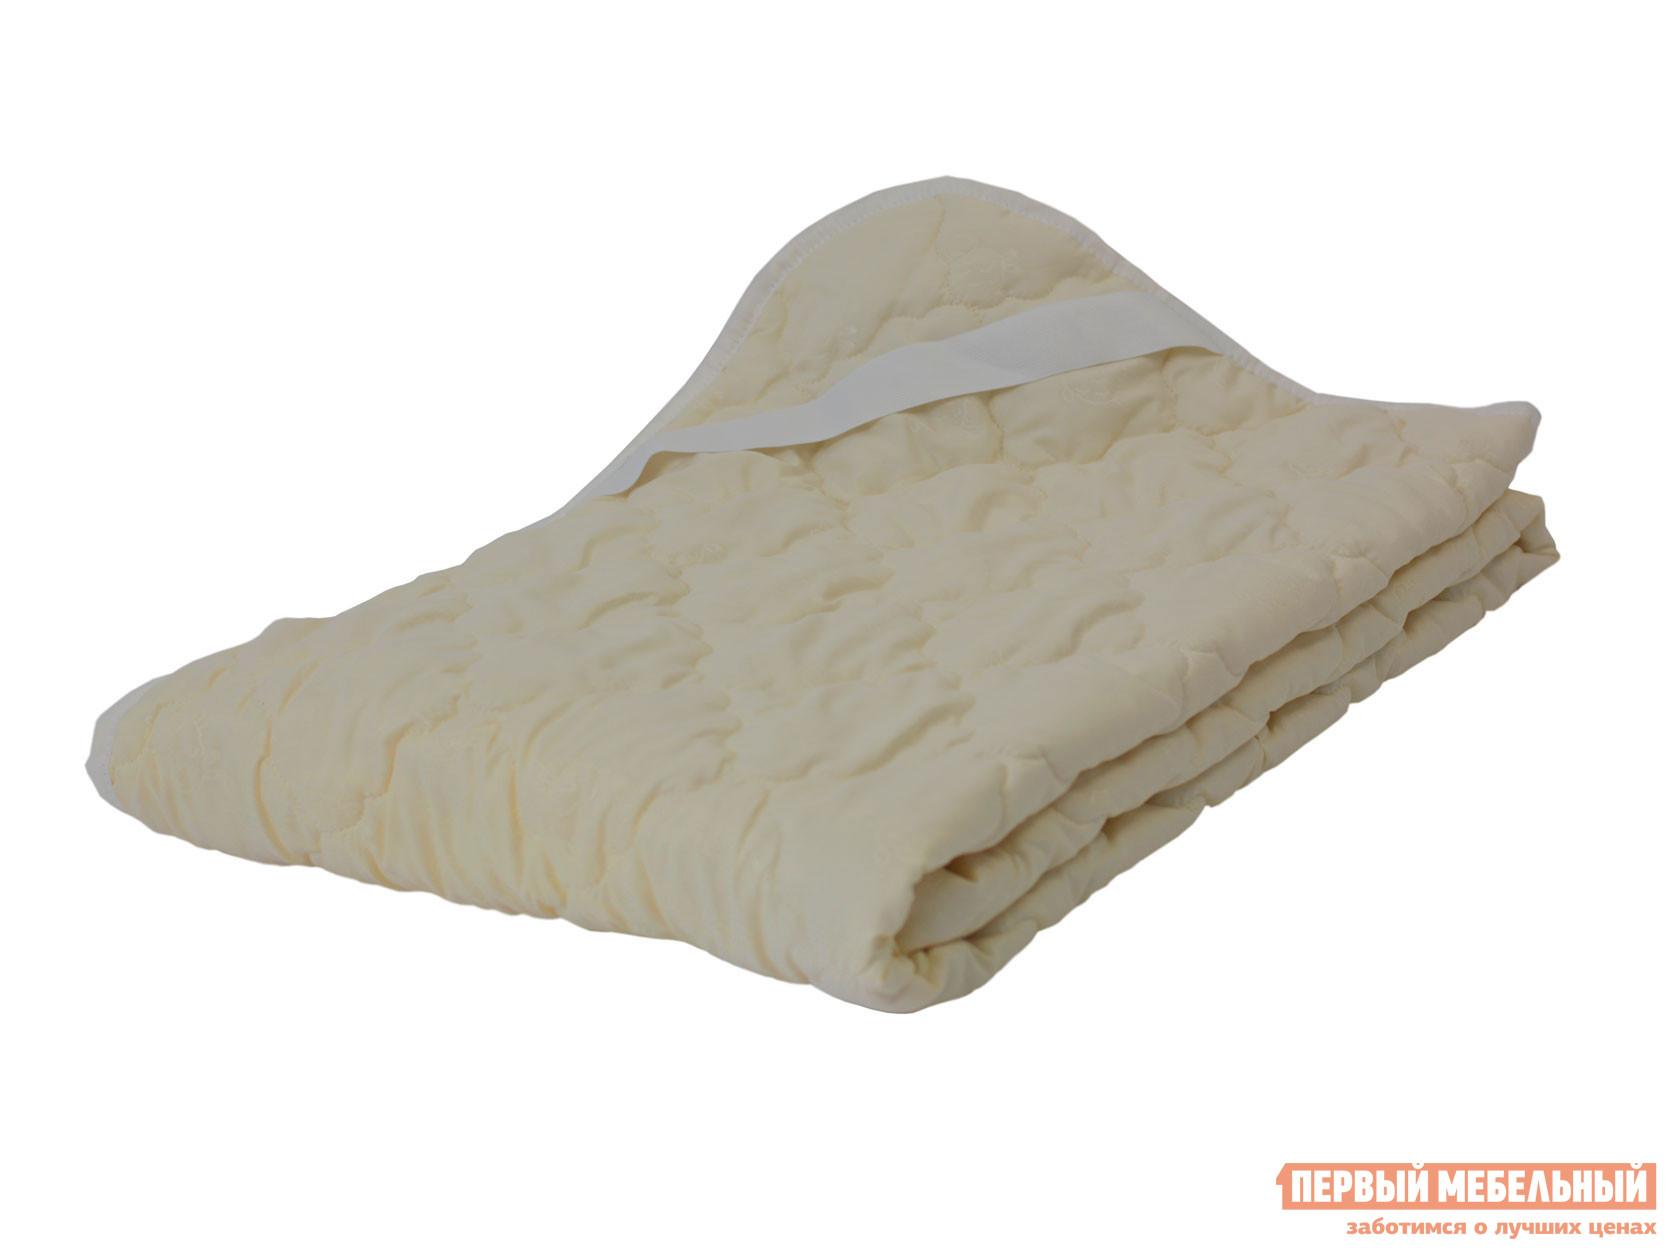 Чехол для матраса Наматрасник овечья шерсть микрофибра Молочный, 1400 Х 2000 мм фото